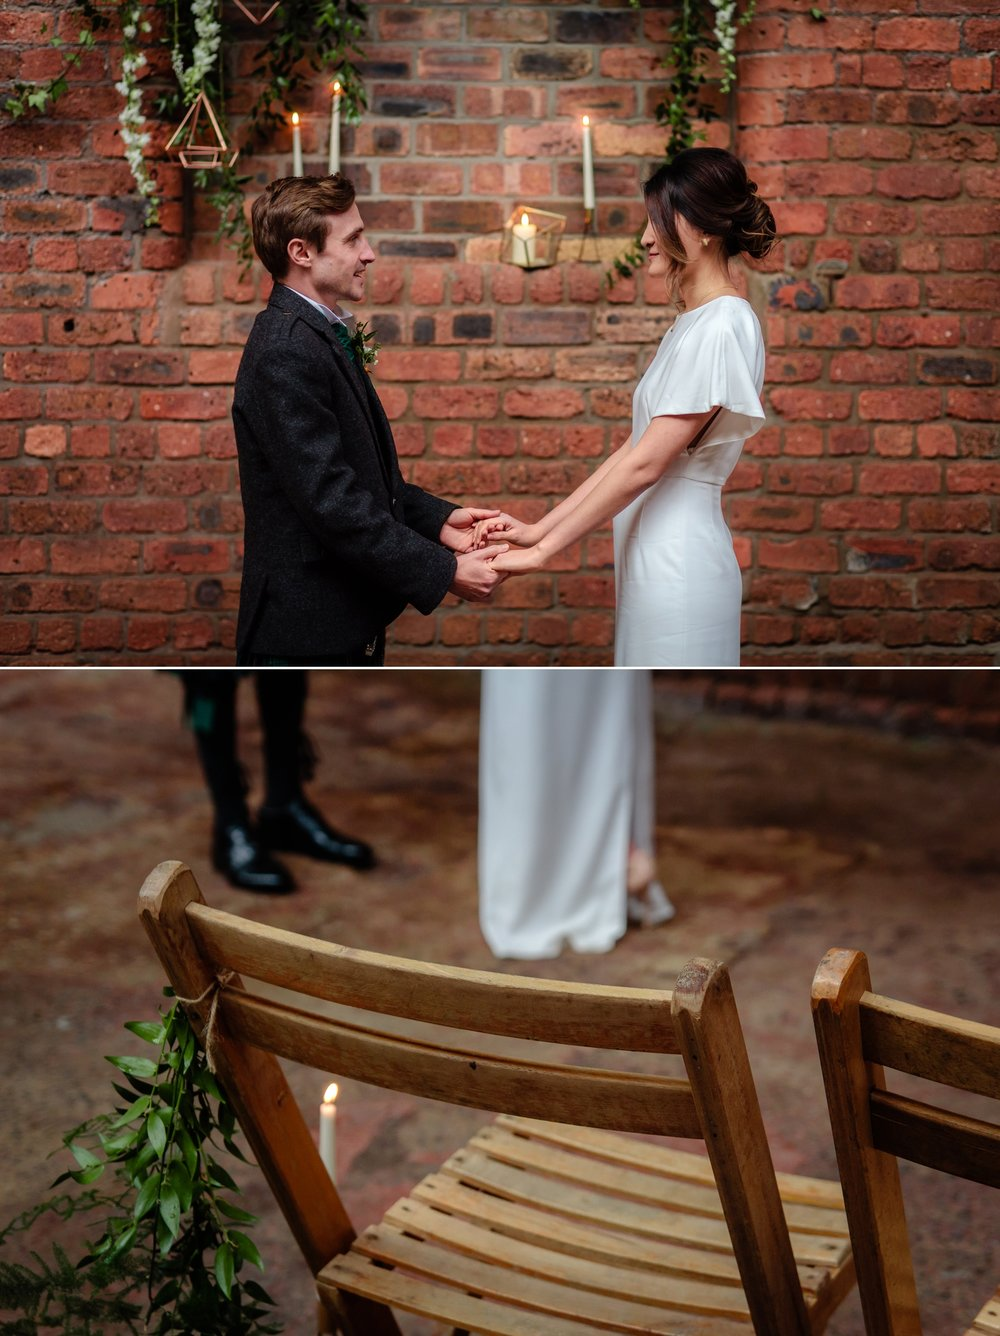 engine-works-wedding-styled-shoot-fotomaki-photography-61.jpg